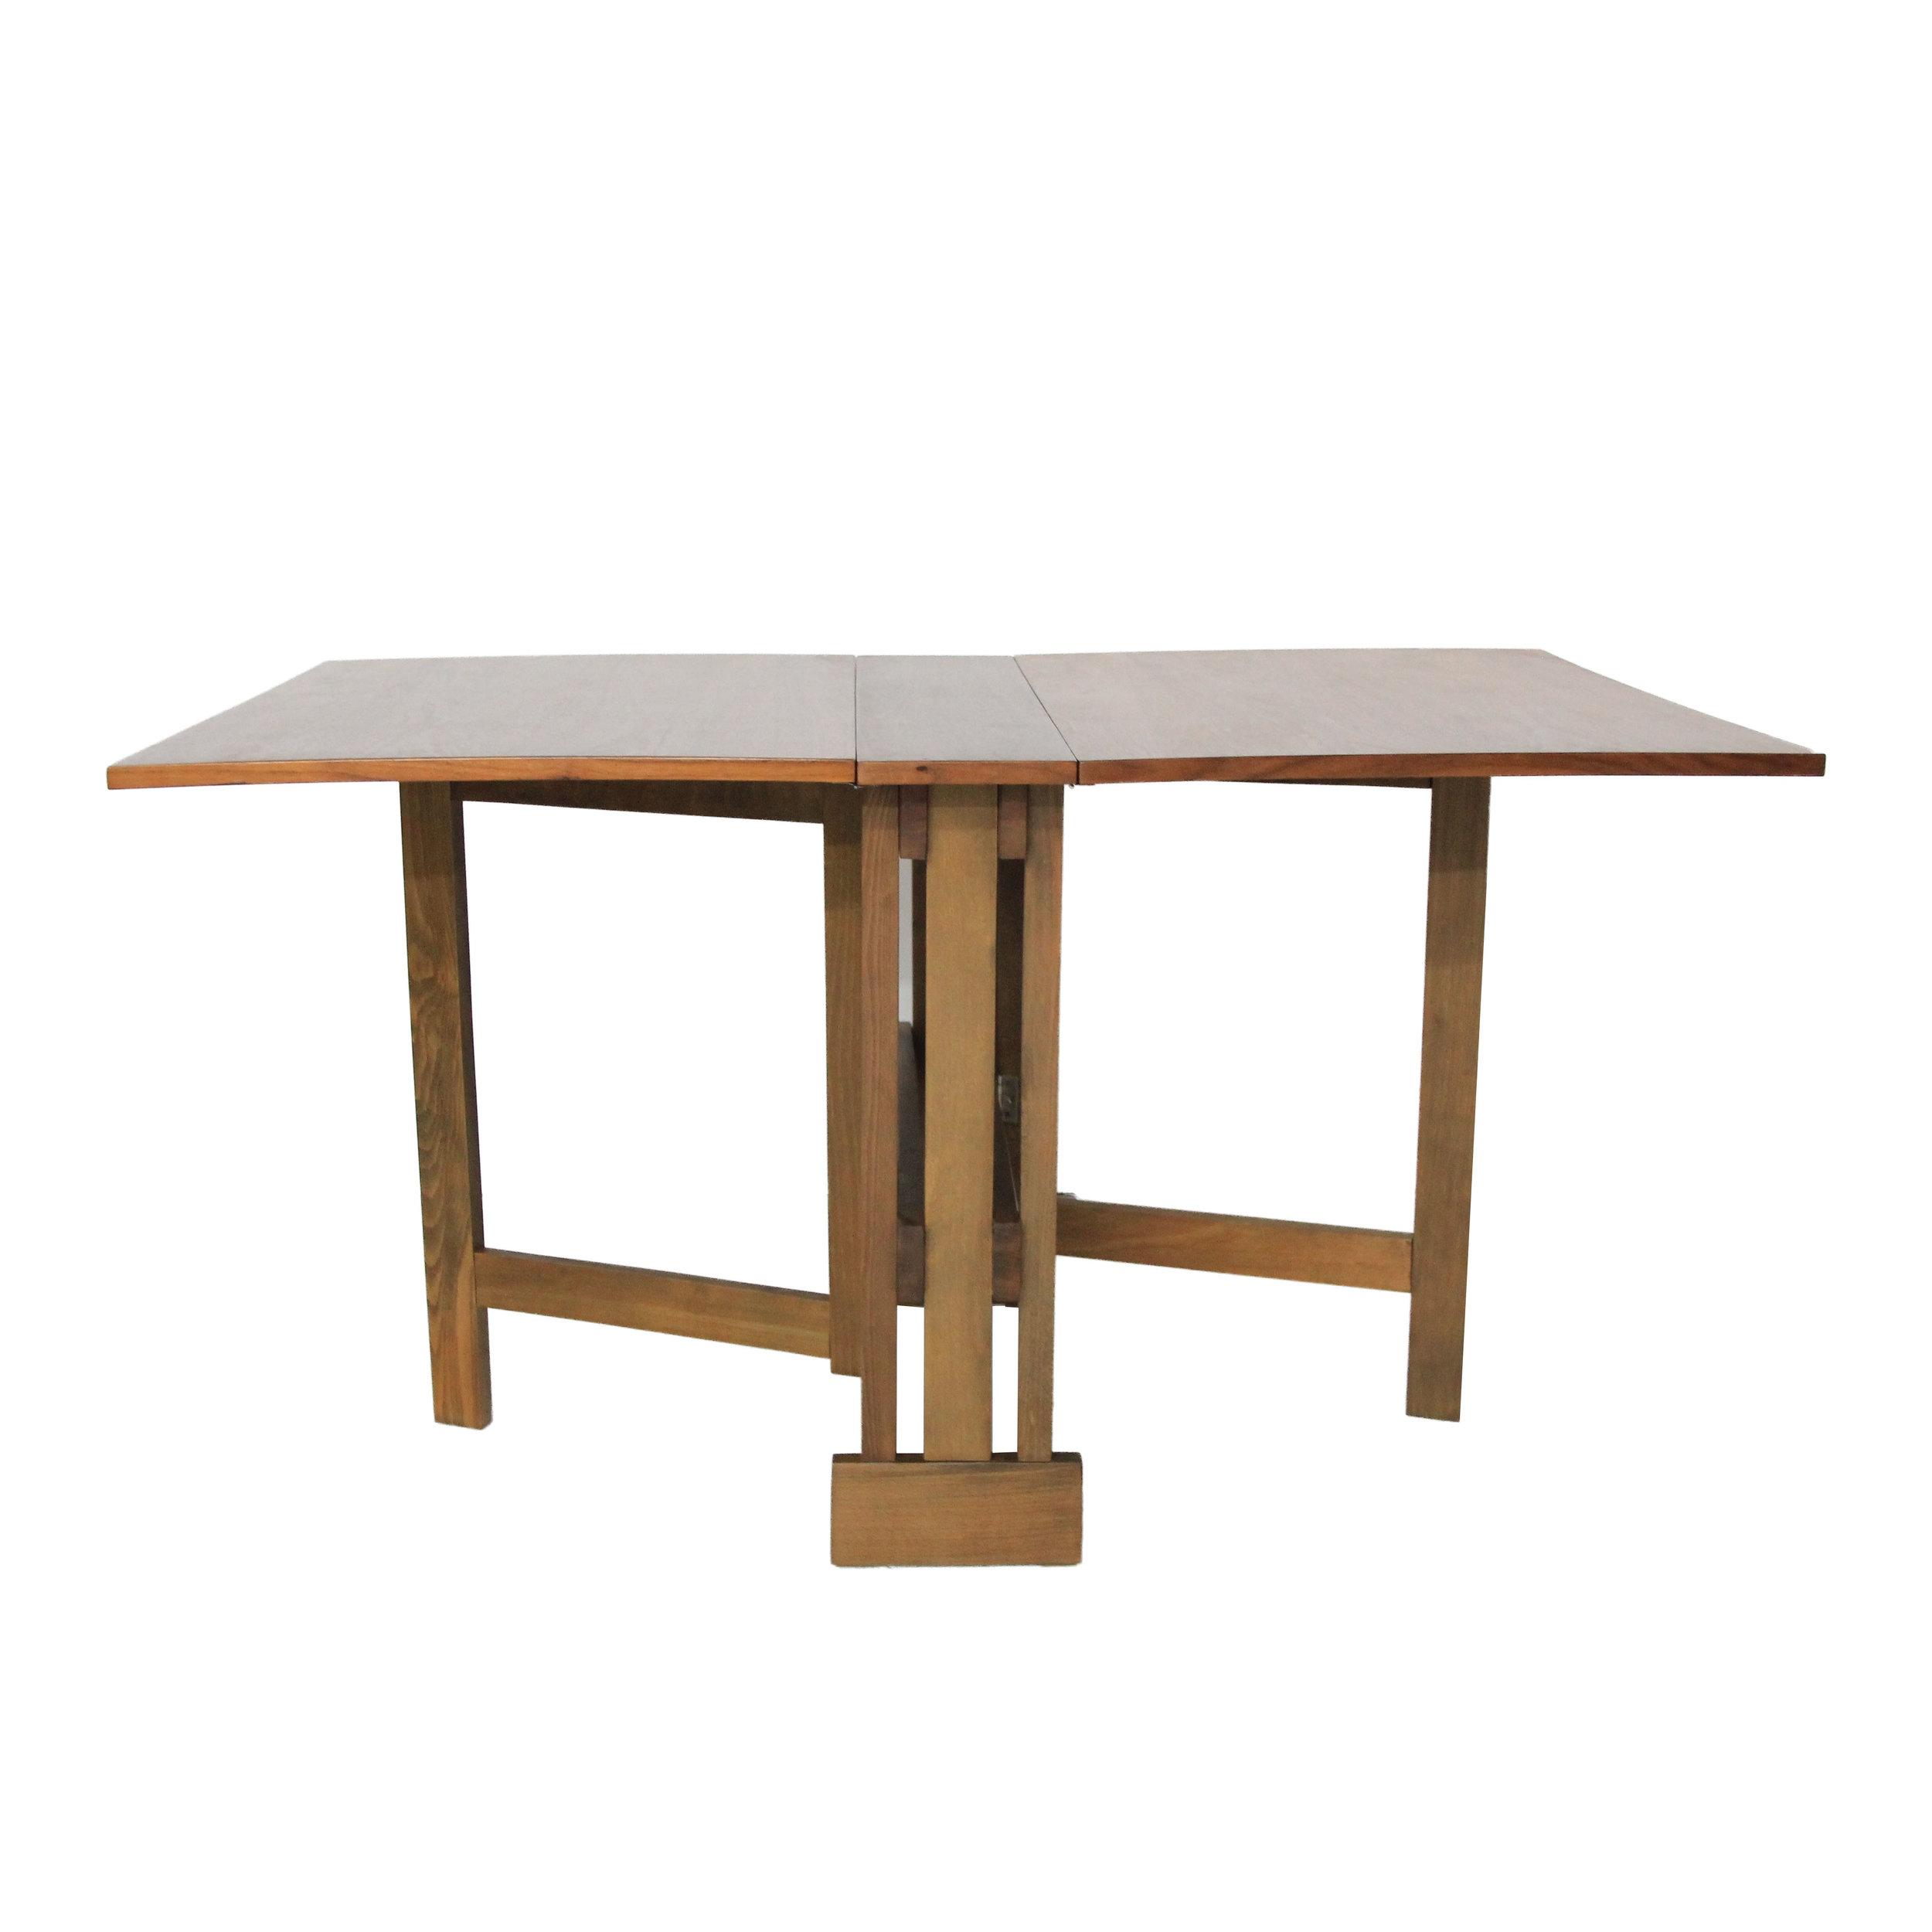 Vintage Mid Century Modern Folding Dining Table